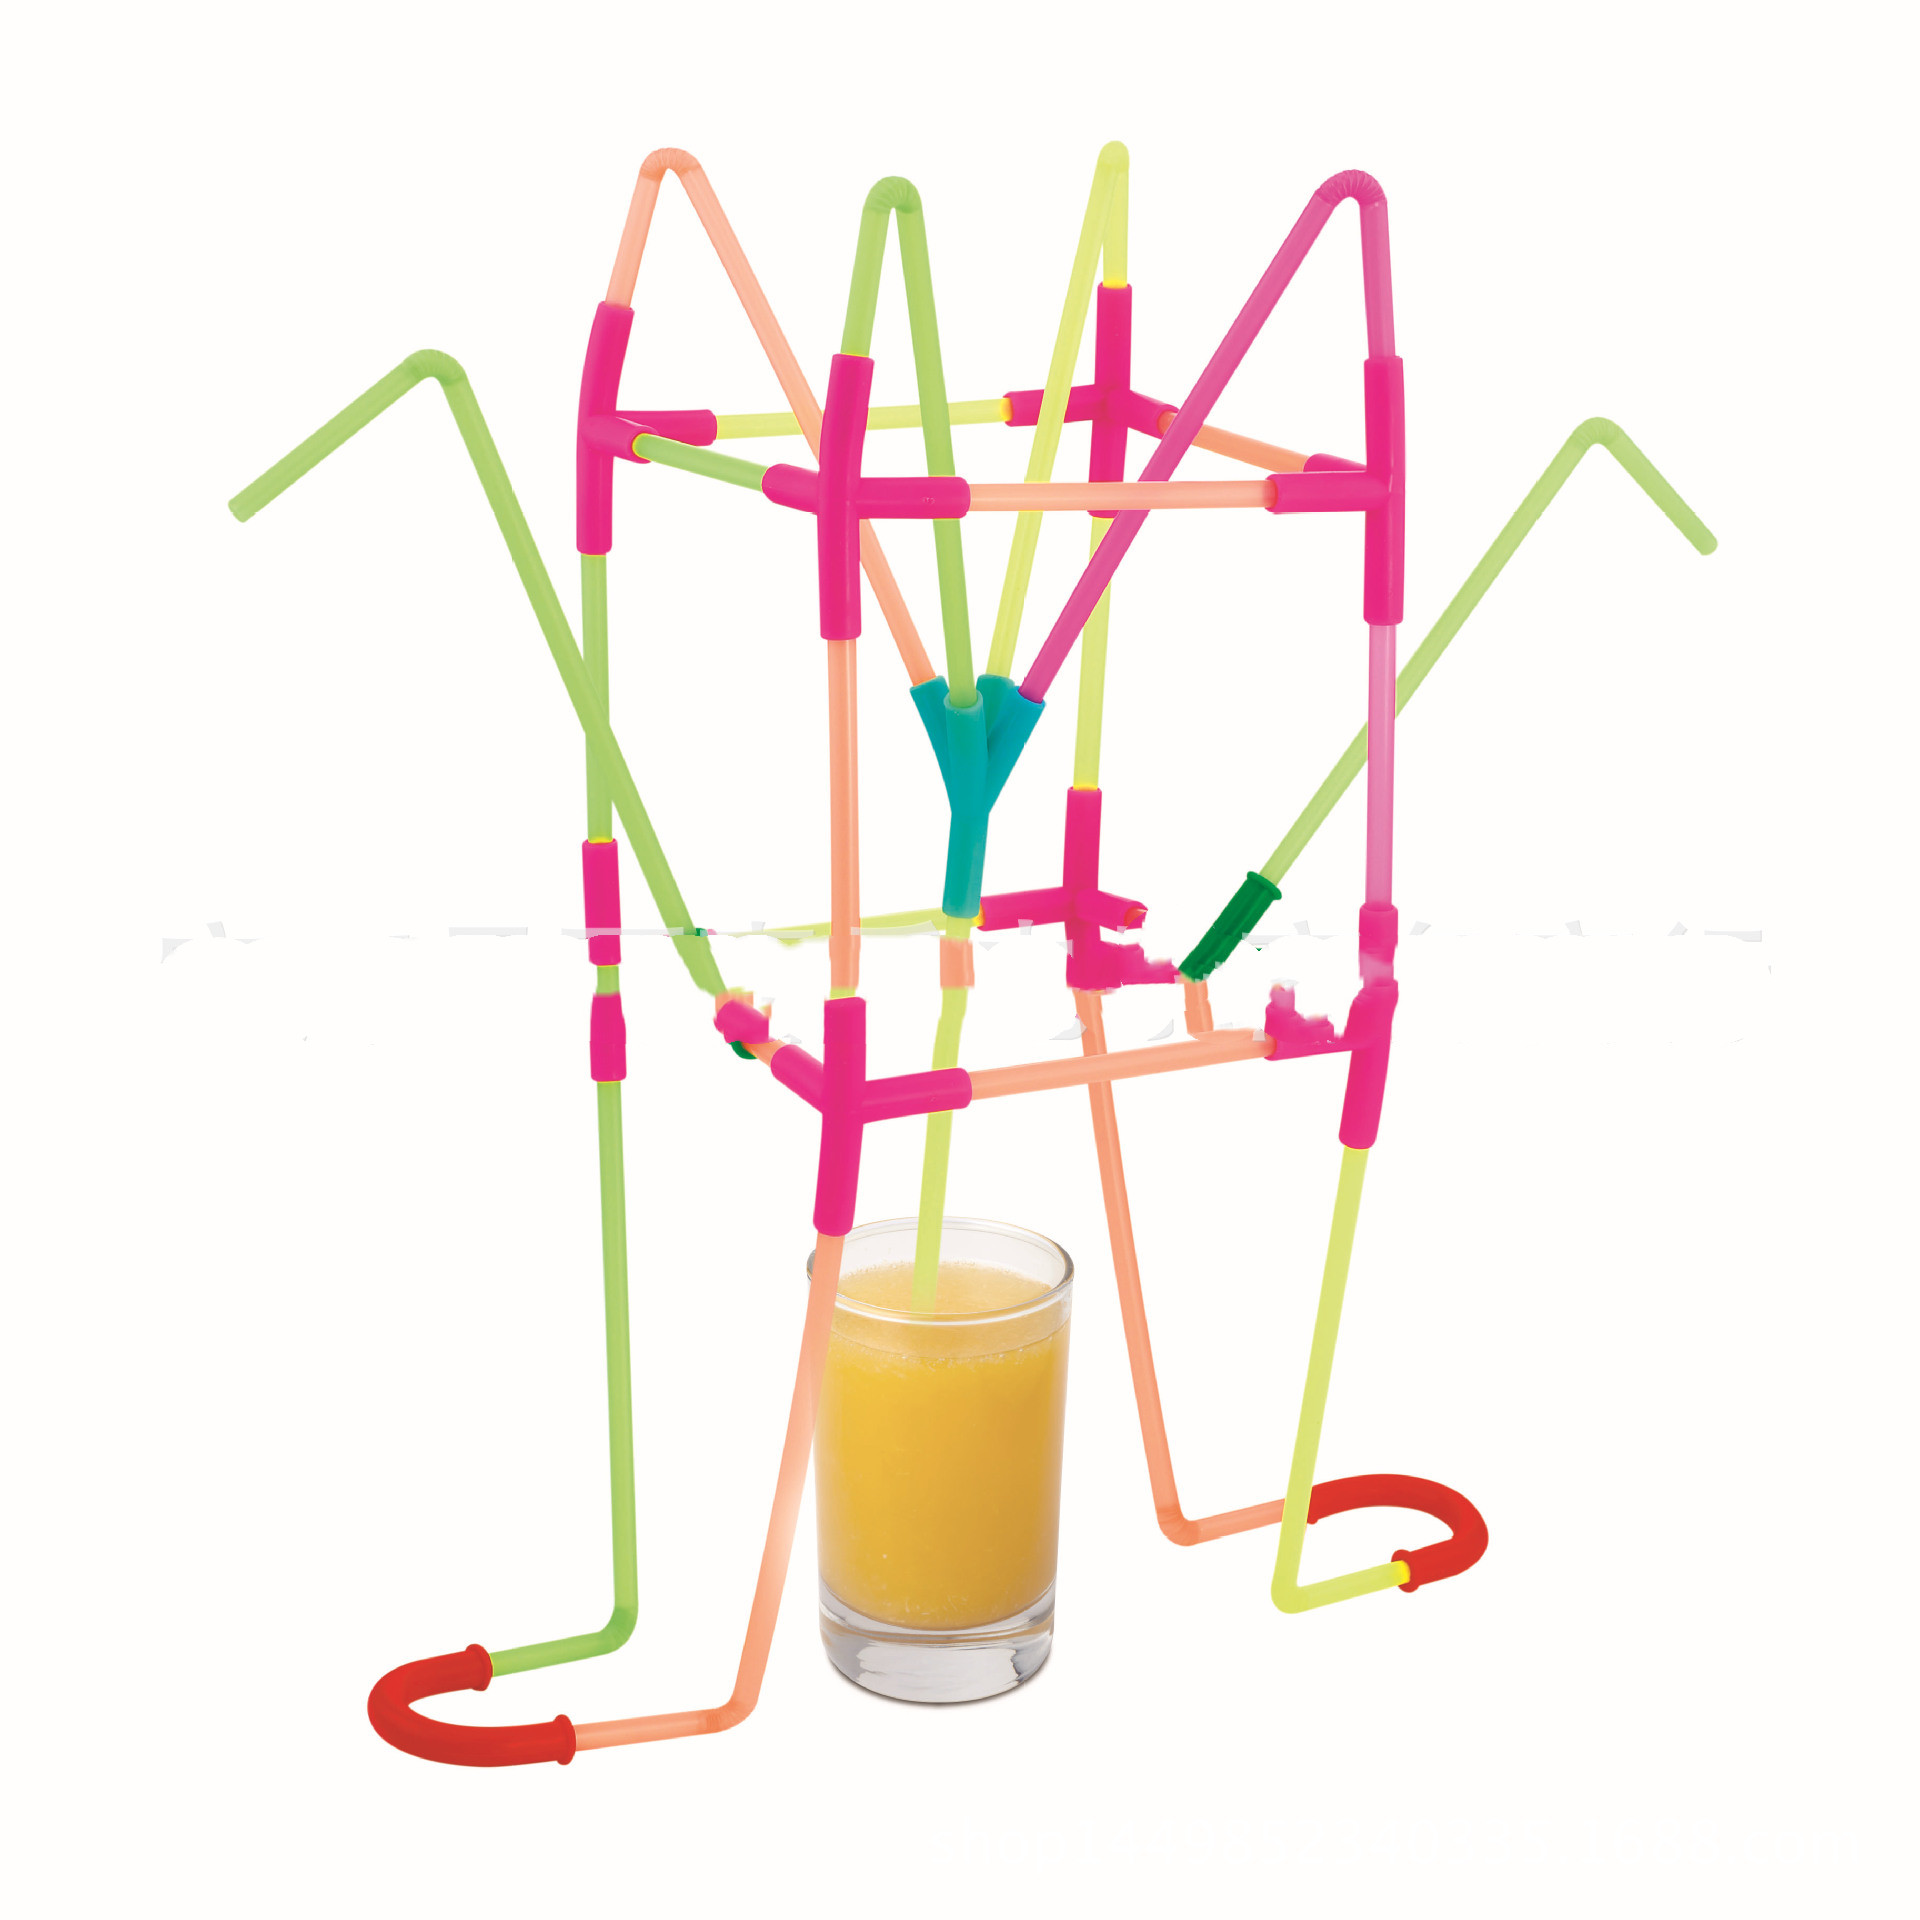 DIY Fun Drinking Straw Connector Kit 1